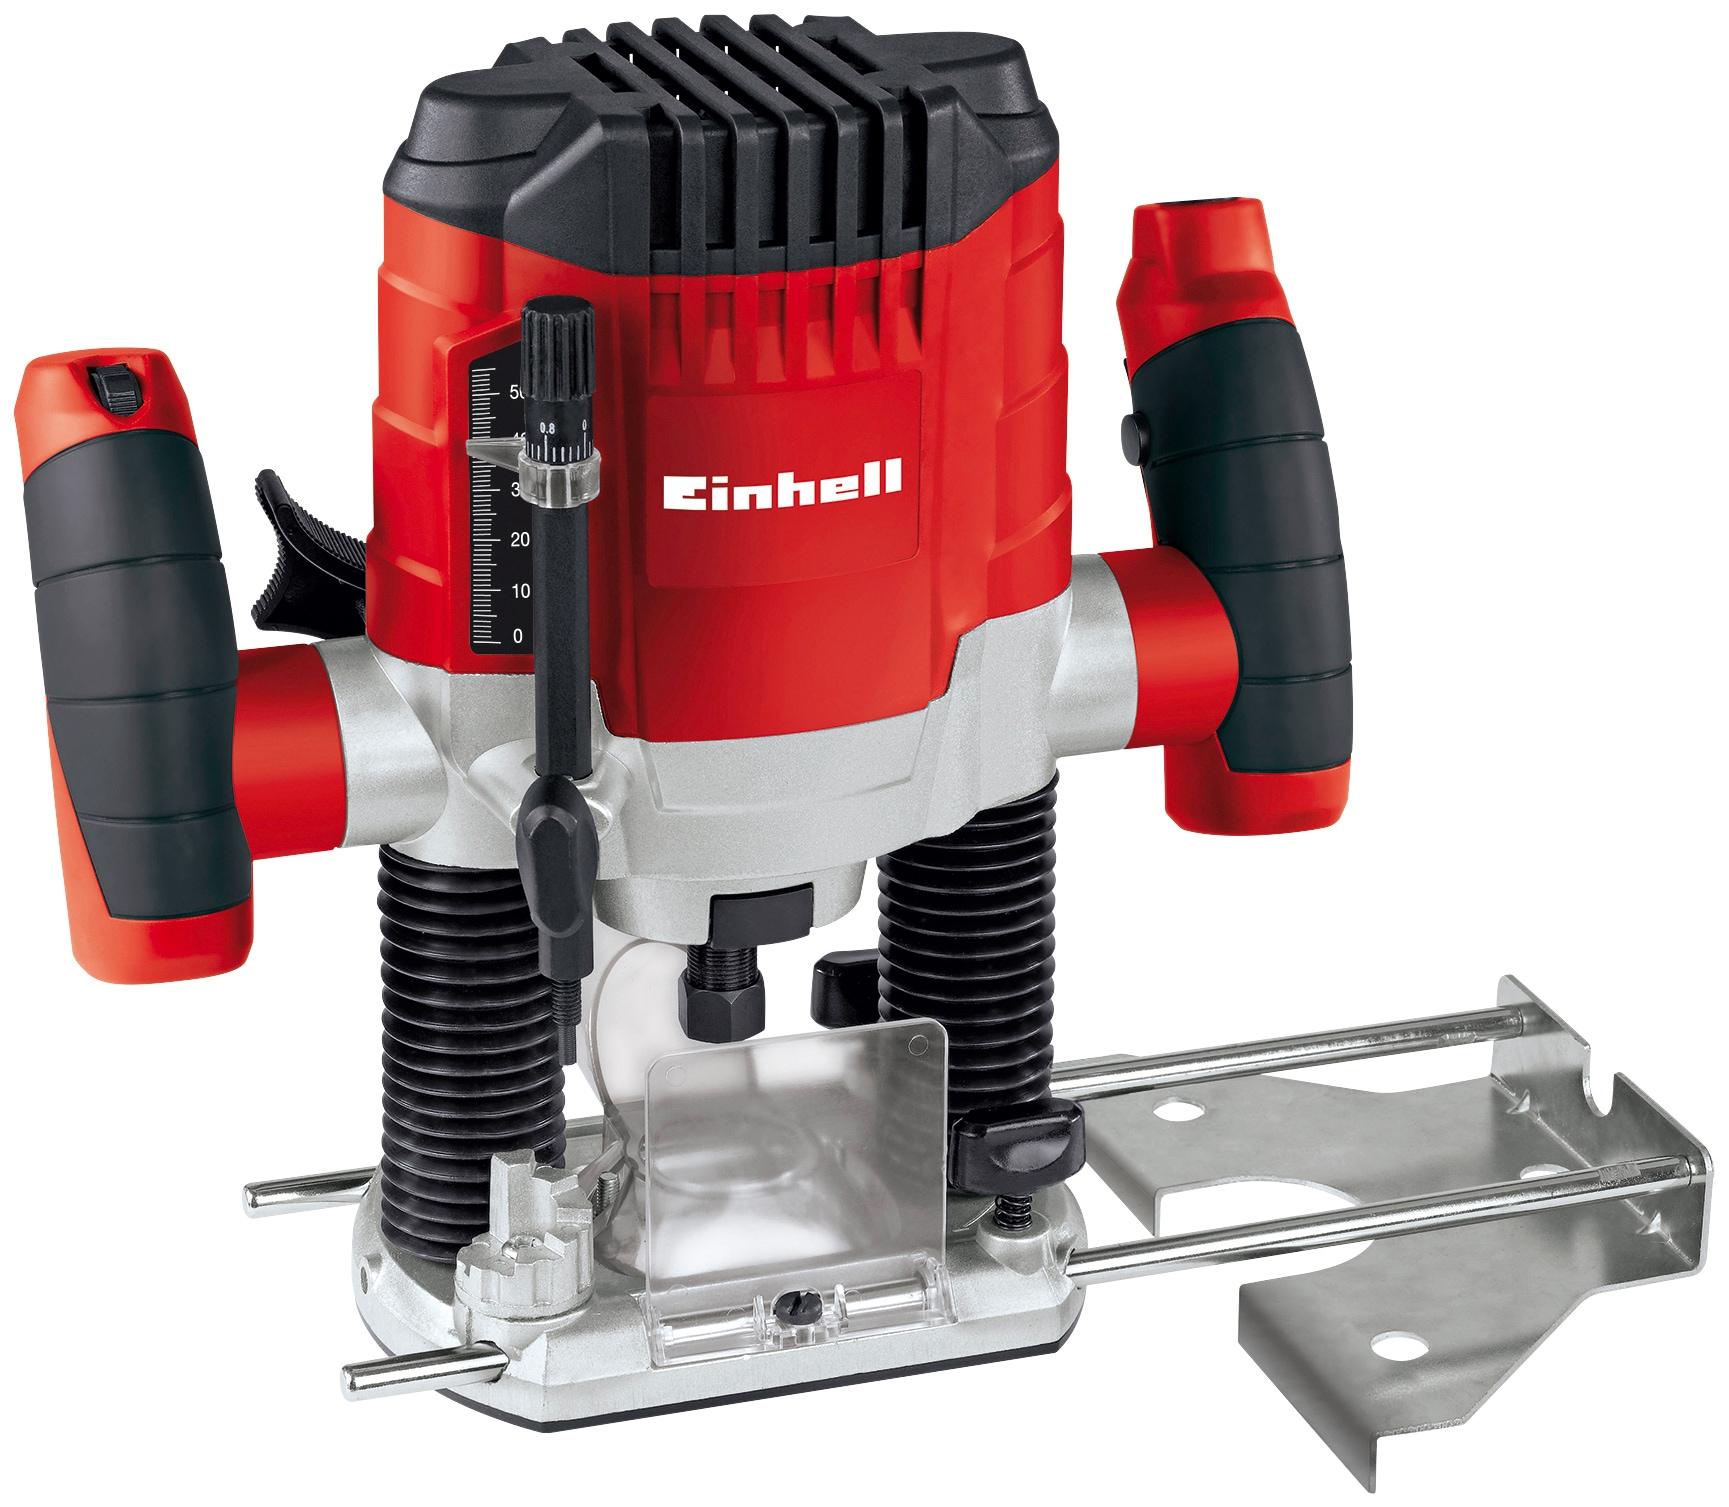 Einhell Oberfräse TC-RO 1155E rot Fräsen Werkzeug Maschinen